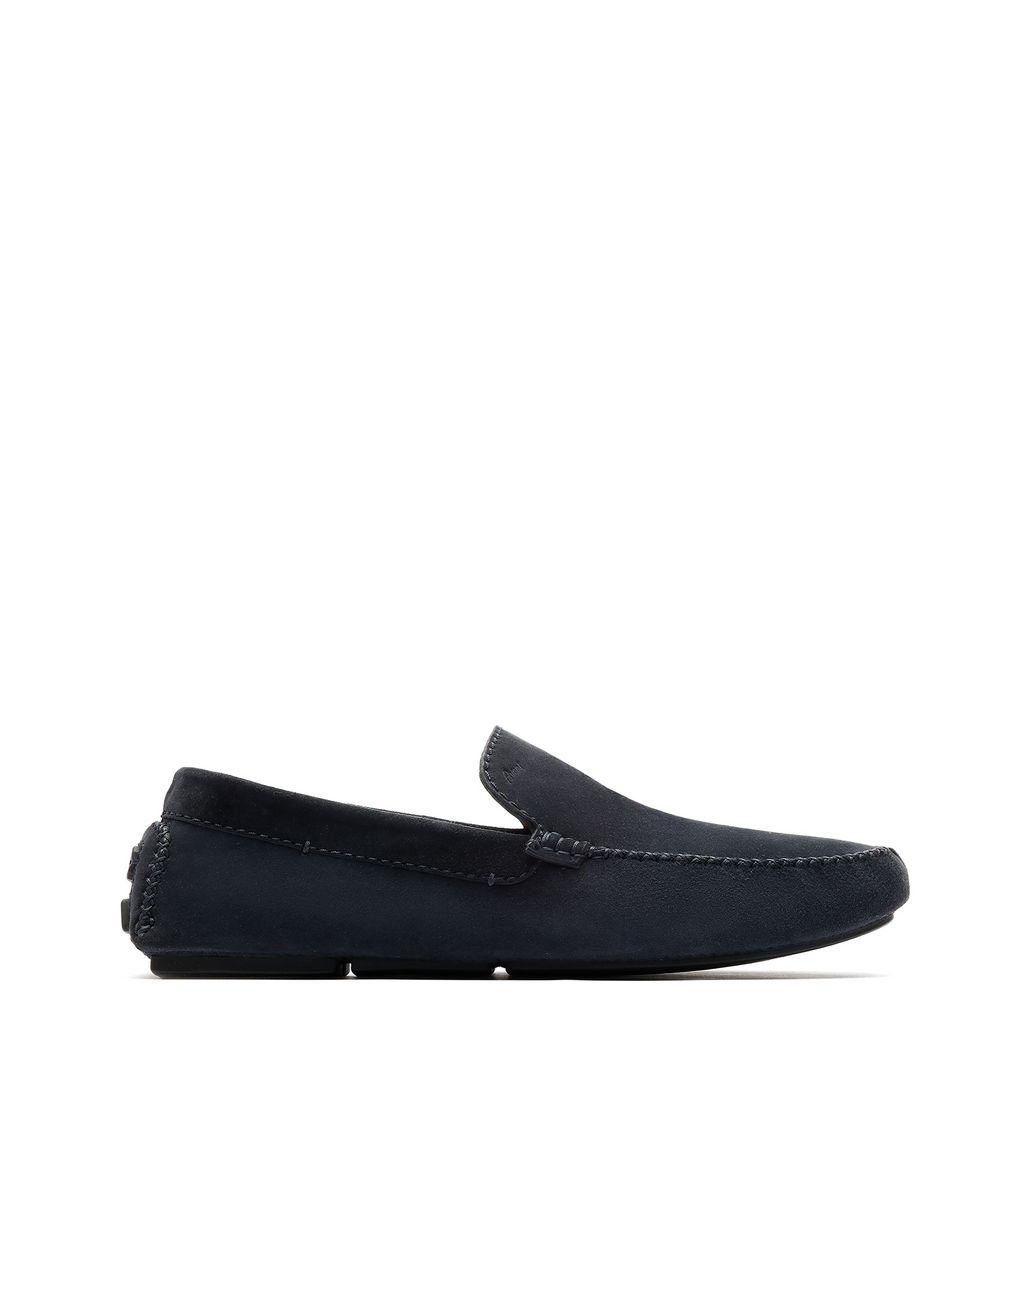 160762a24af9f BRIONI Navy Blue Suede Driver Shoes Loafers Man f ...